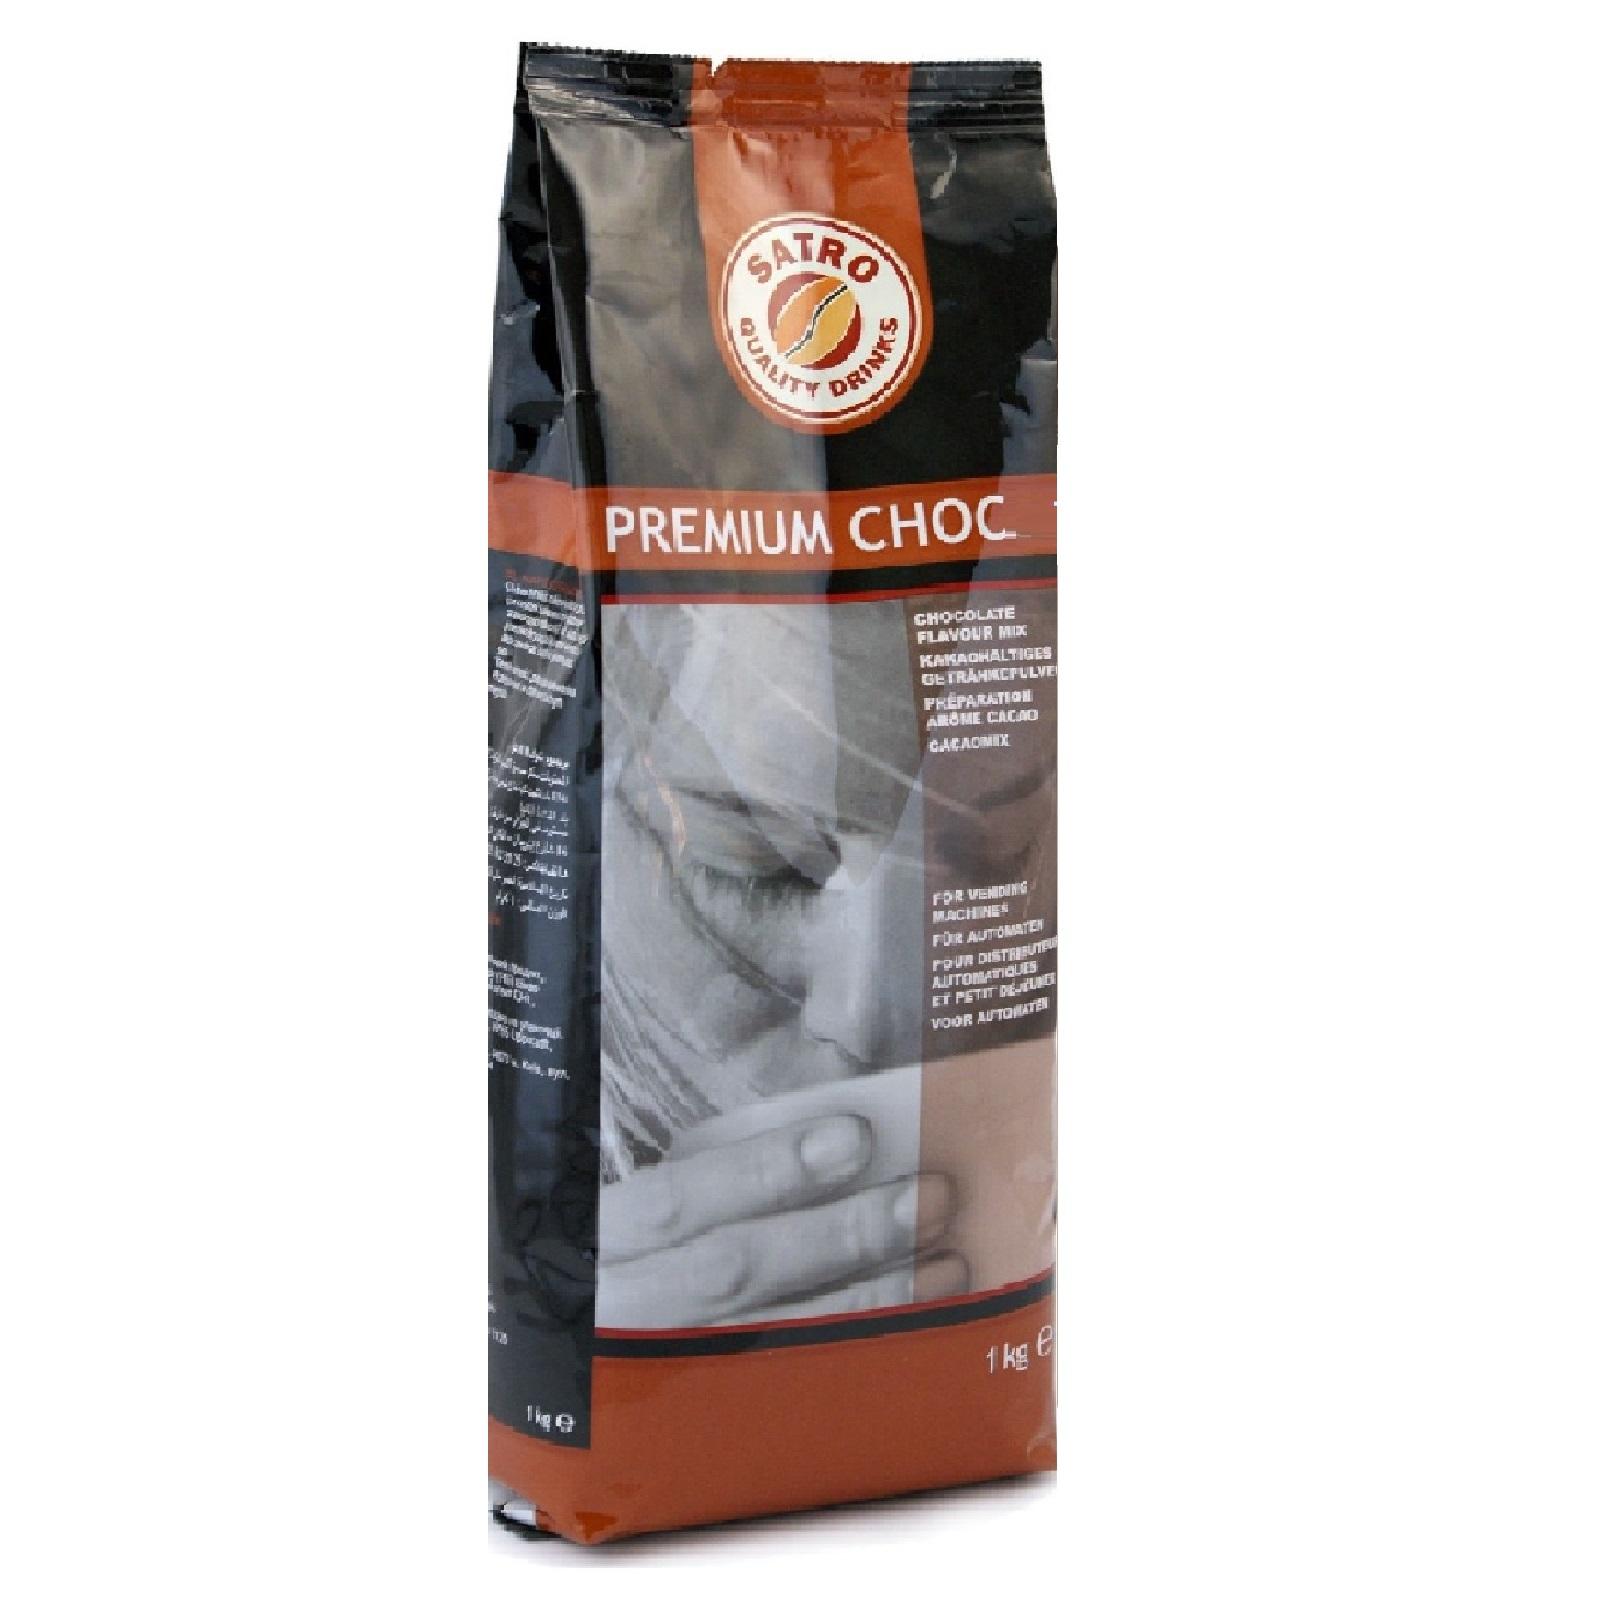 Satro Premium Choc 14 Instant-Kakao 10 x 1kg Vending